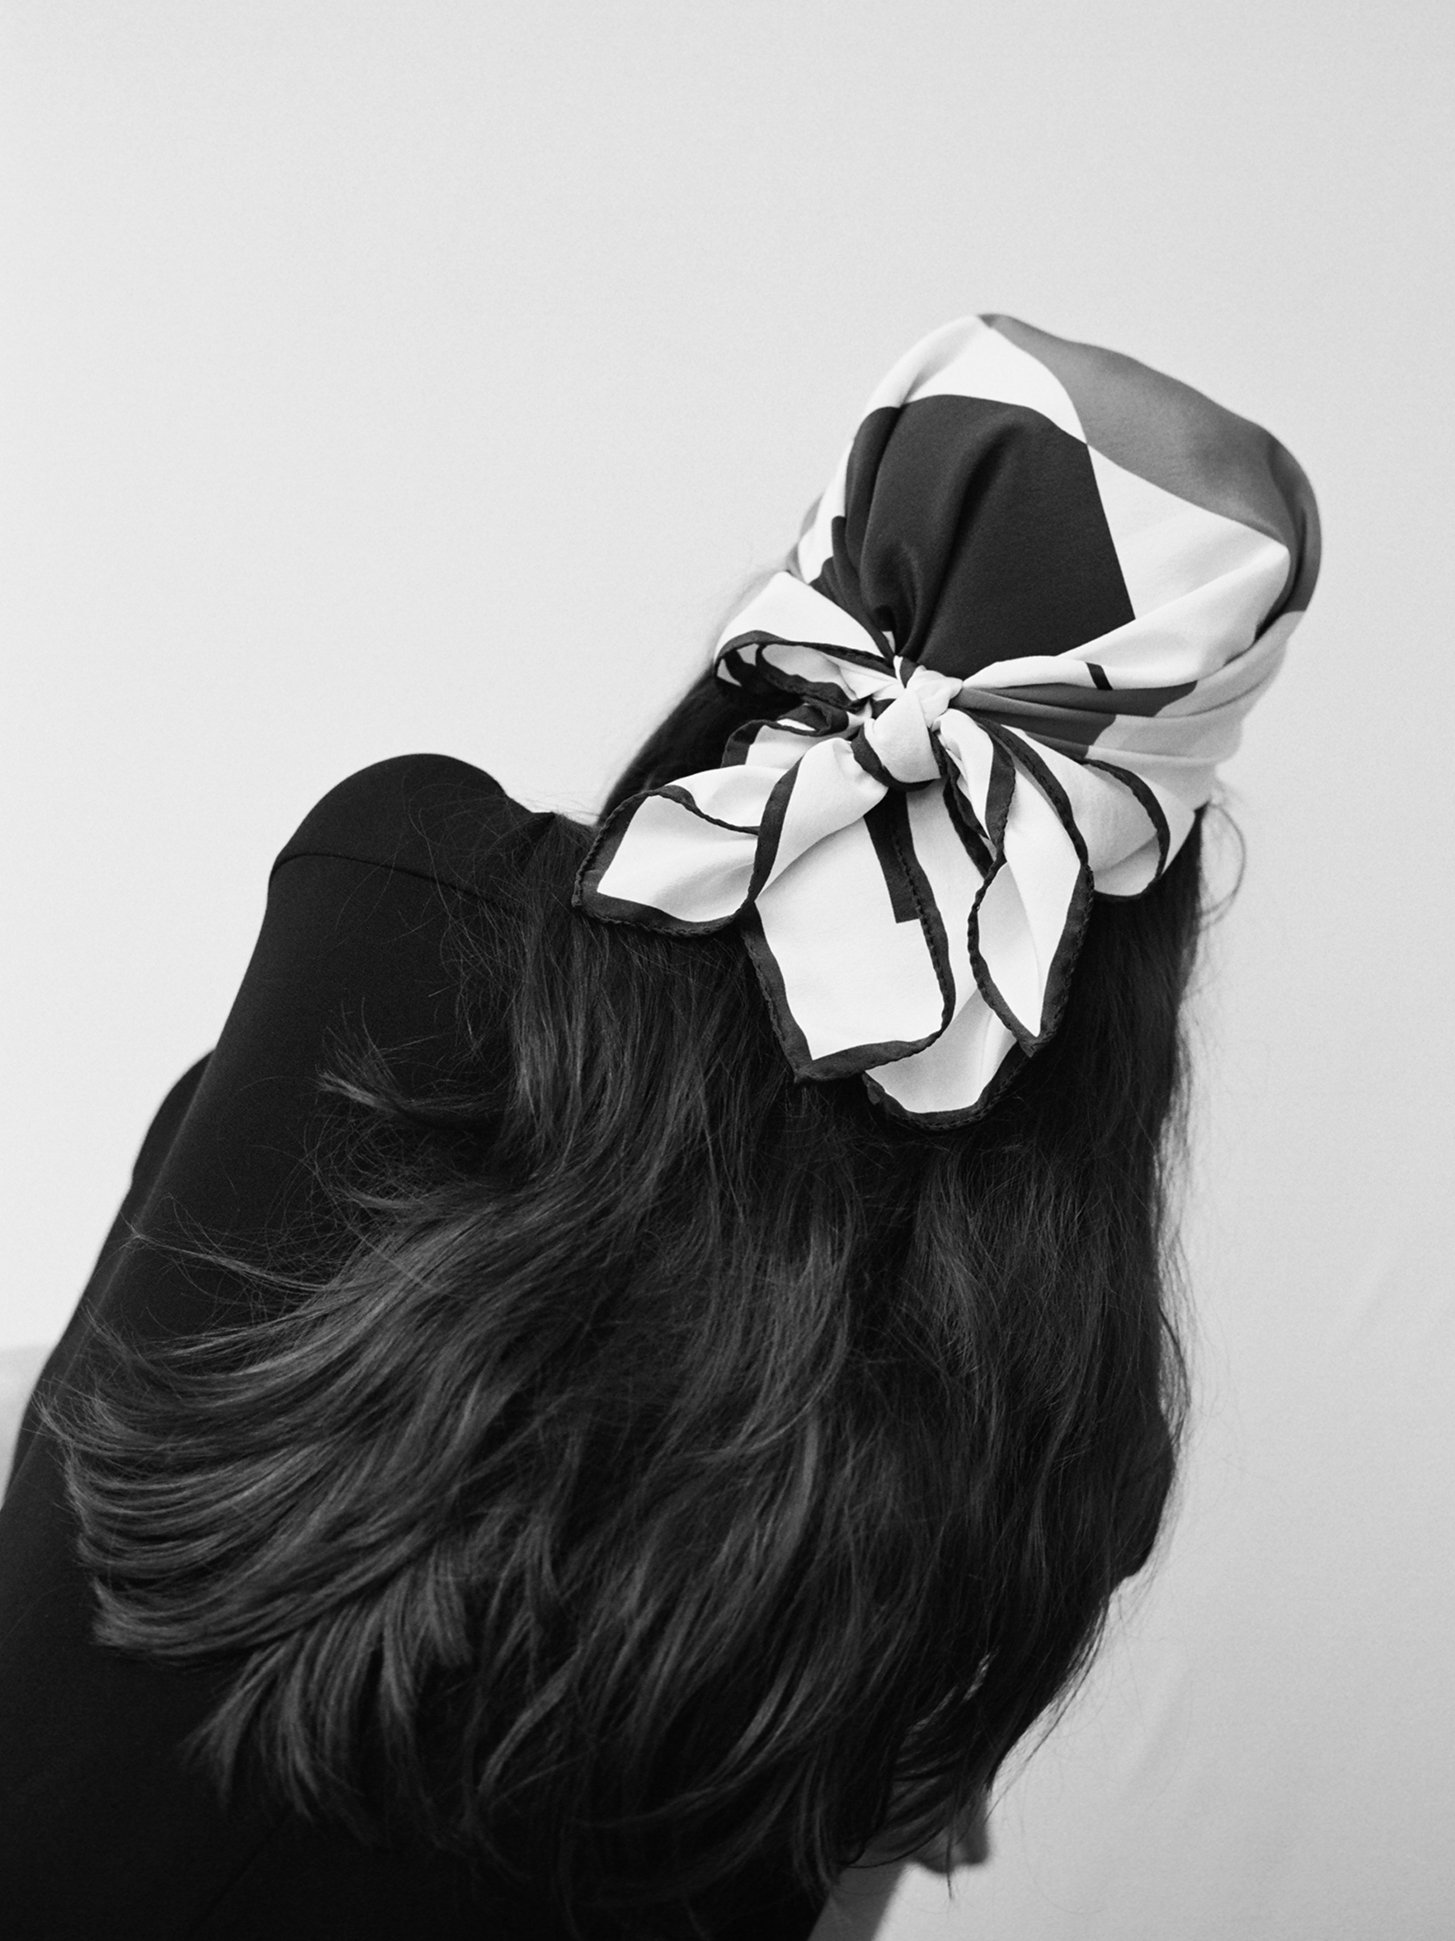 An elegant scarf for adding detail